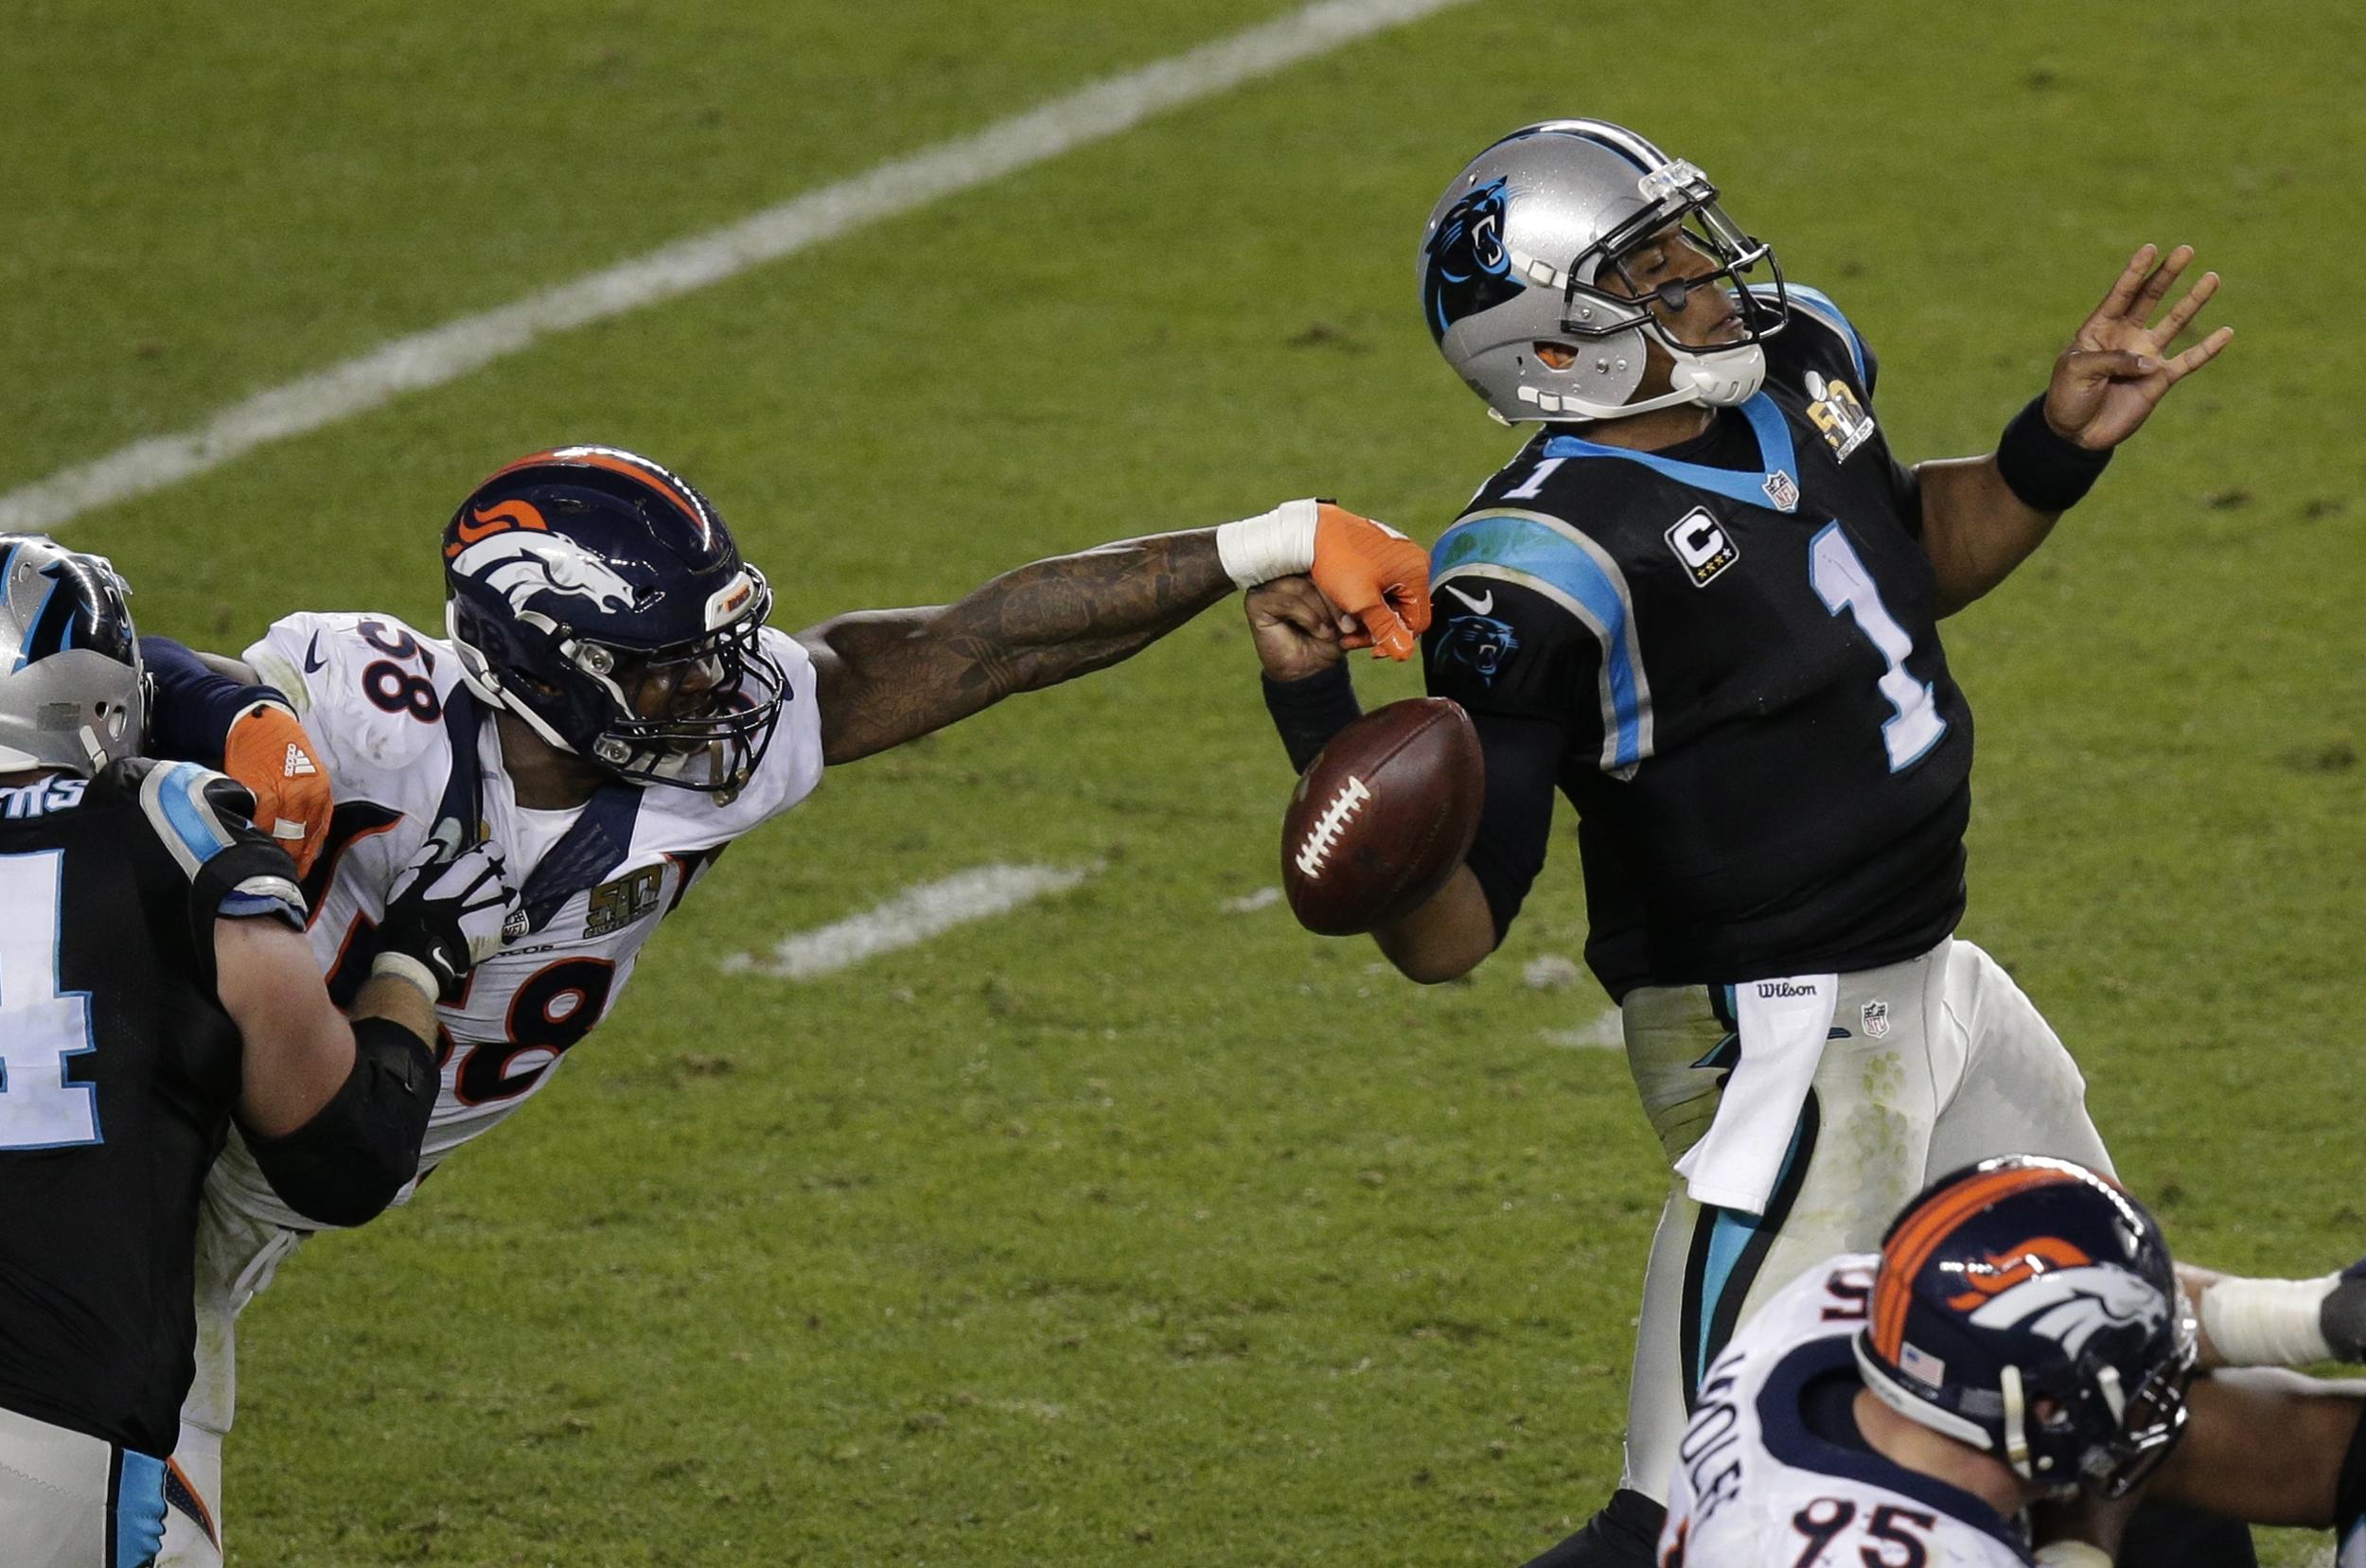 Von Miller Broncos Linebacker Edits Himself Into Picture of